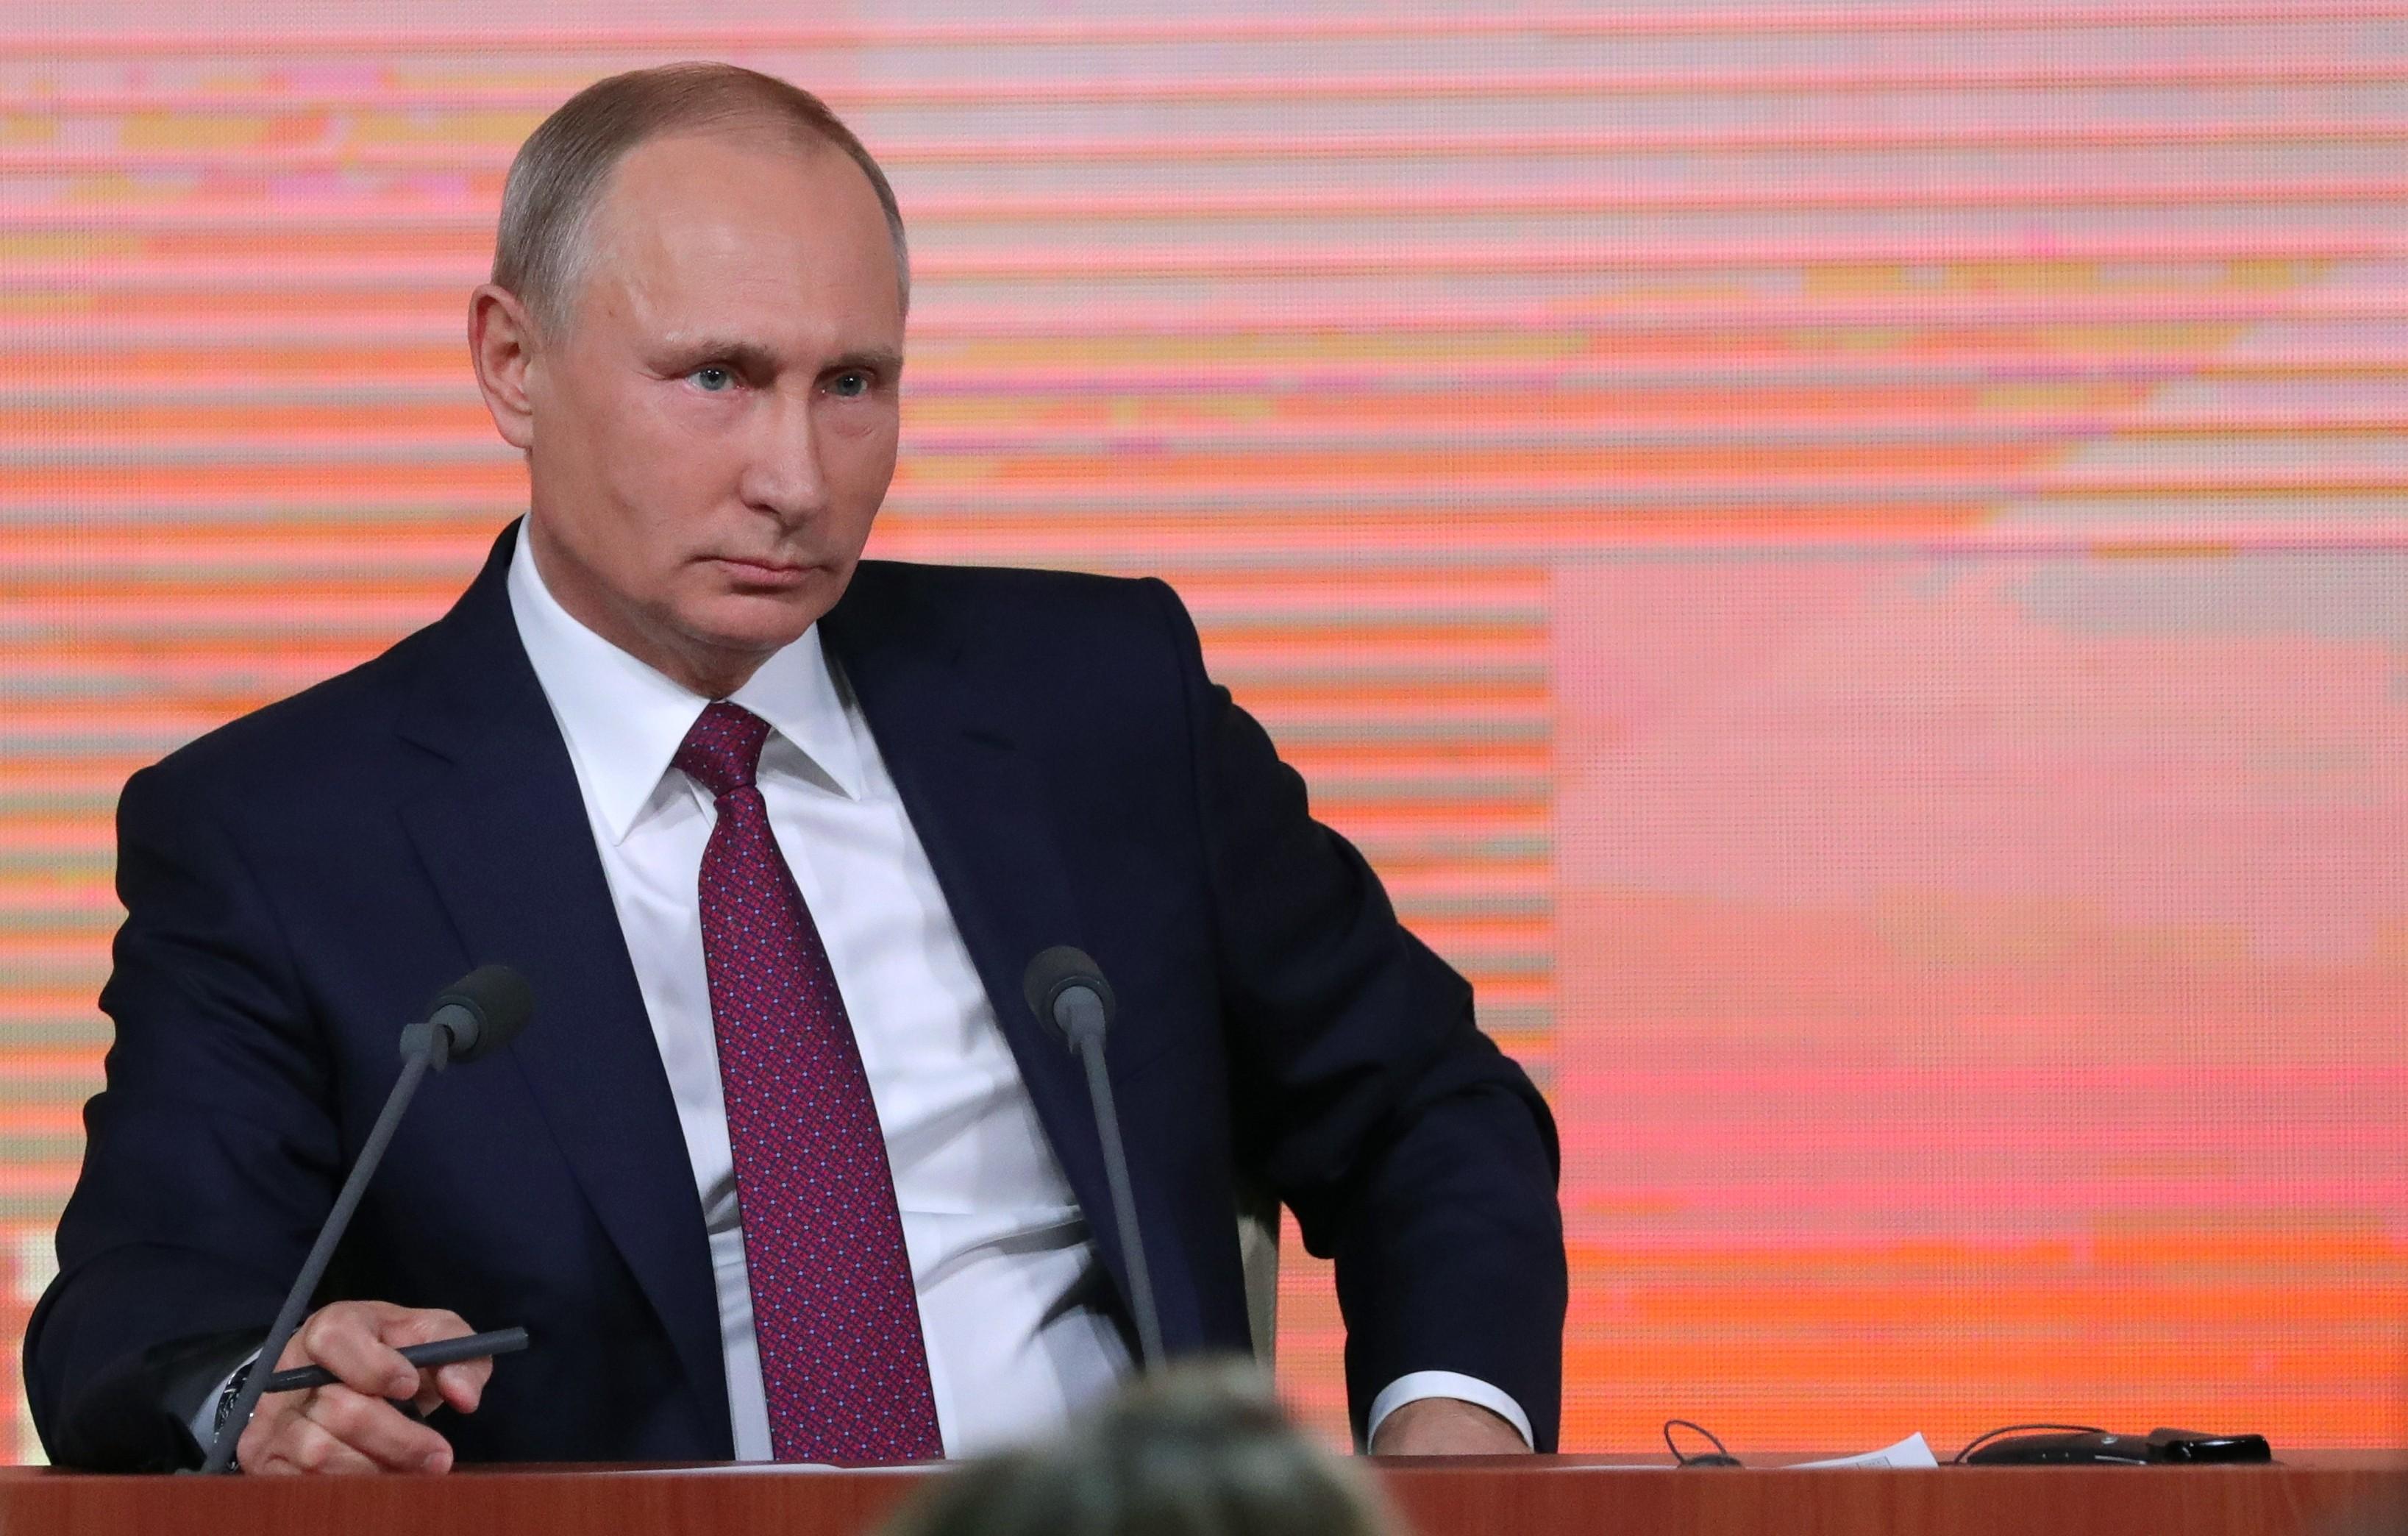 <p><span>Президент РФ Владимир Путин.&nbsp;Фото &copy; РИА Новости/Михаил Климентьев</span></p>